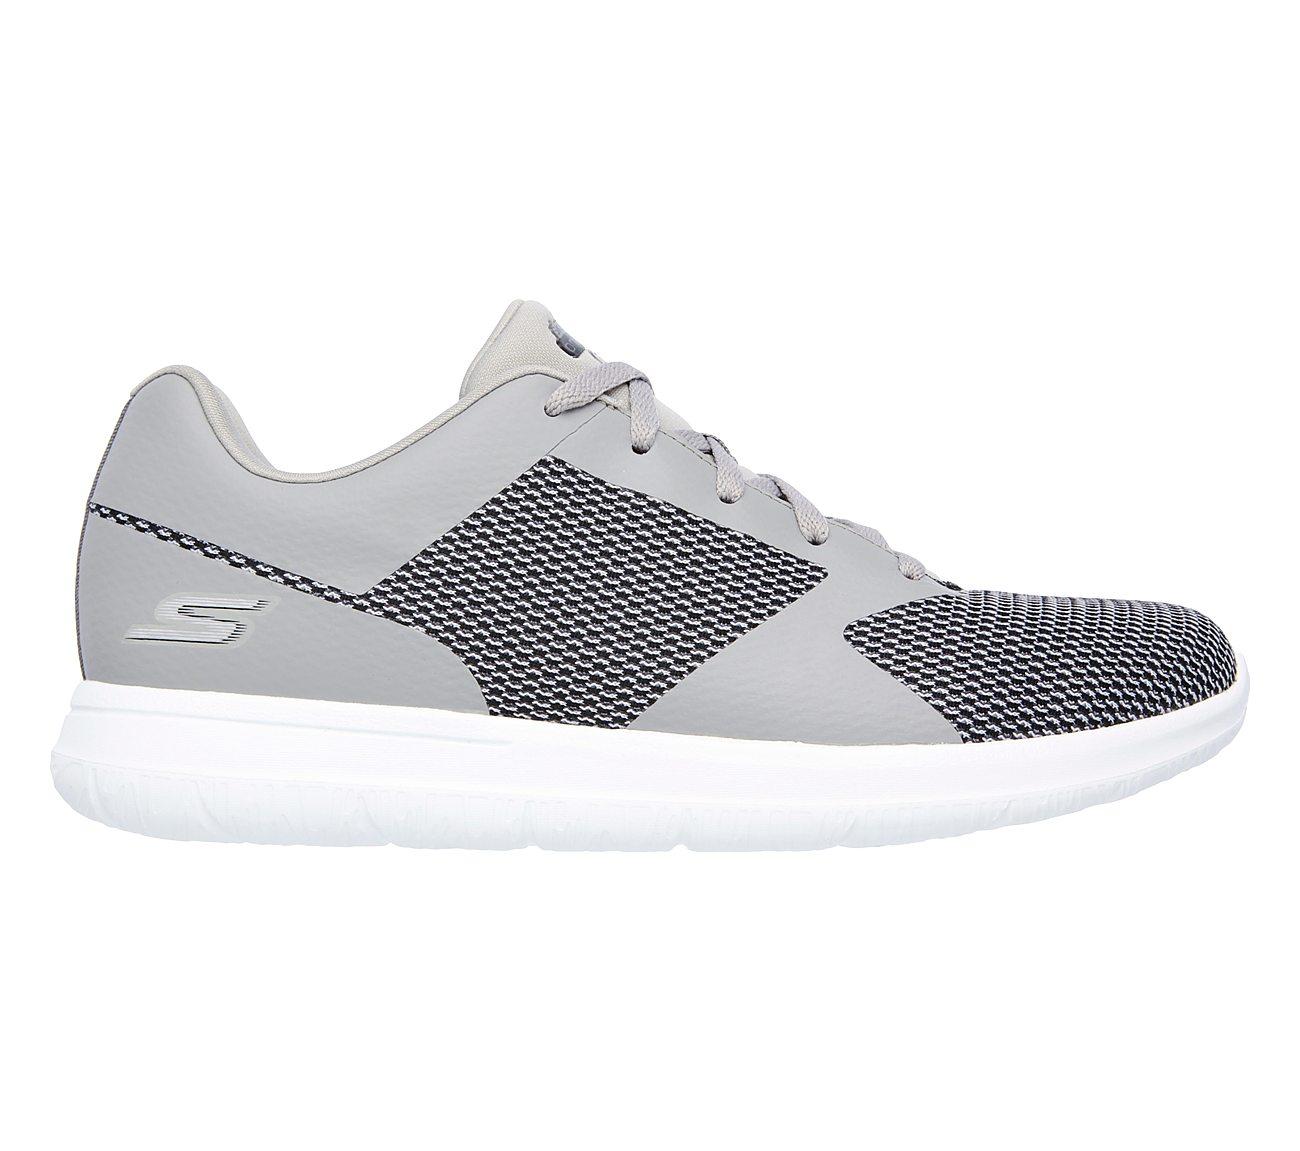 Buy SKECHERS Skechers GOwalk City Echo On the GO Shoes V8uwk